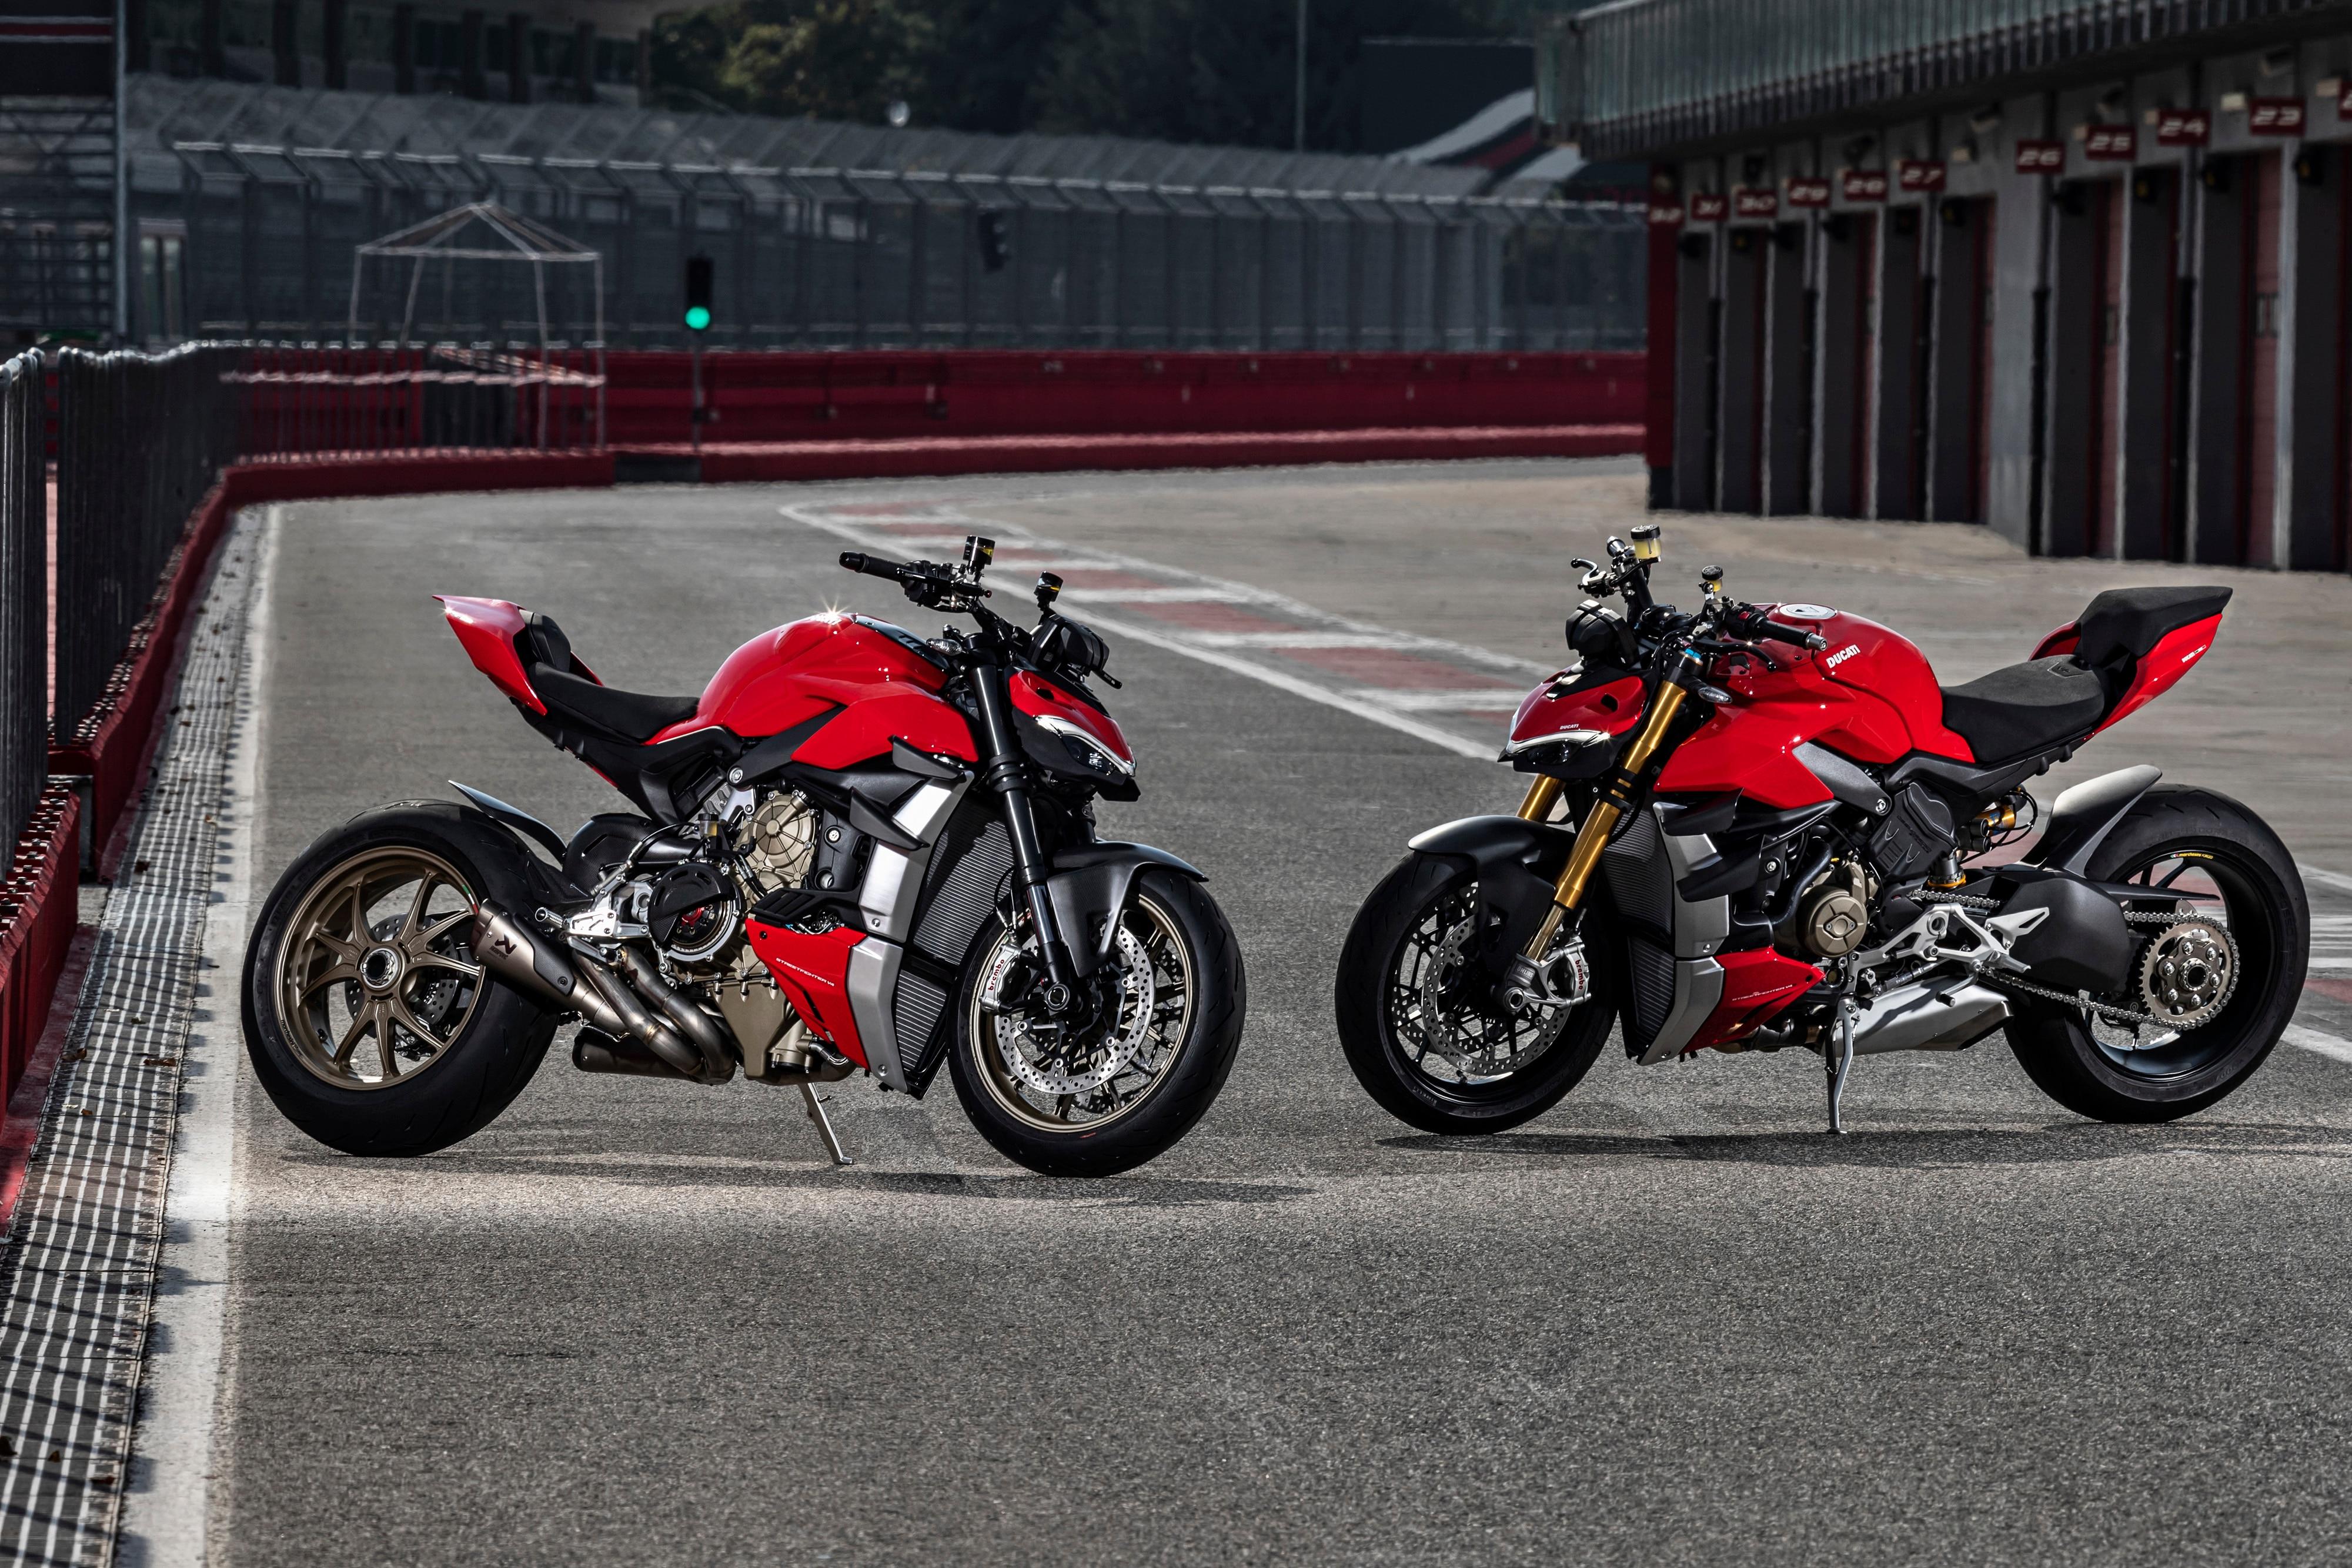 Ducati Streetfighter V4 Unveiled At Ducati World Premiere